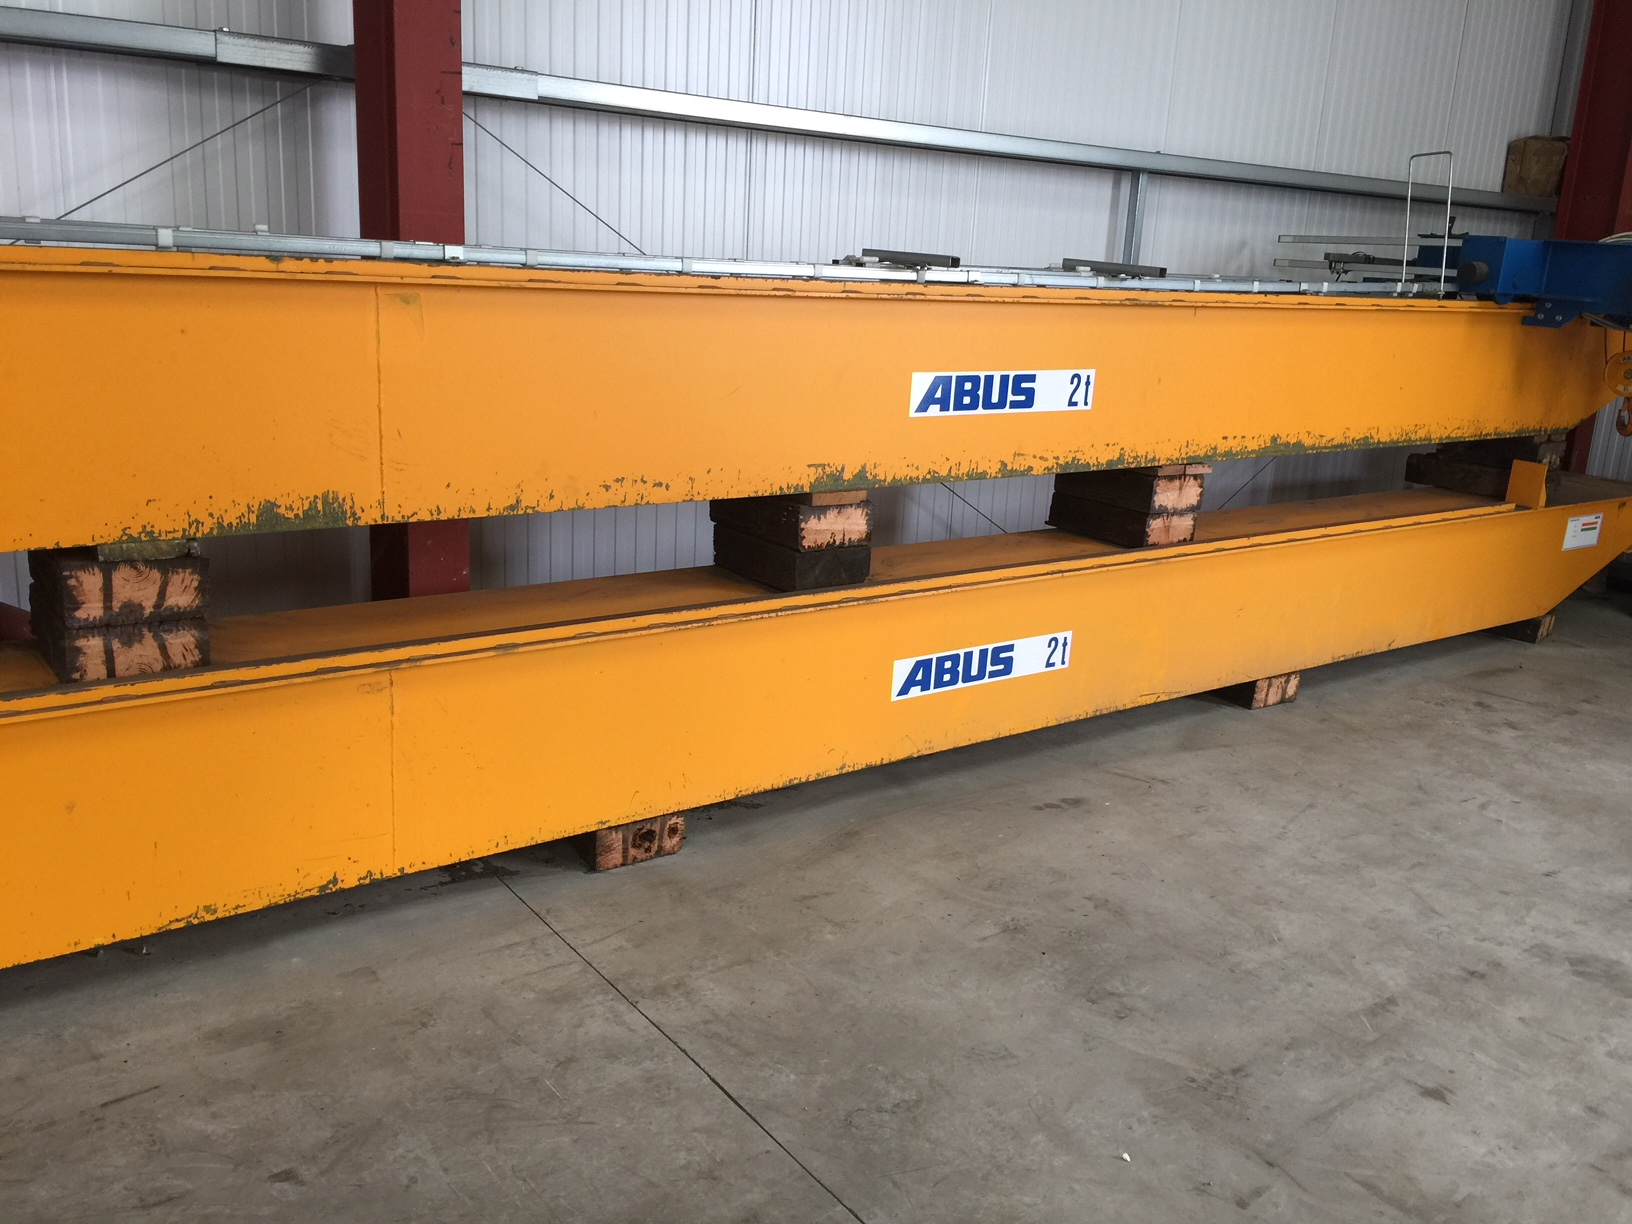 2 tonne SWL Abus Crane - SOLD